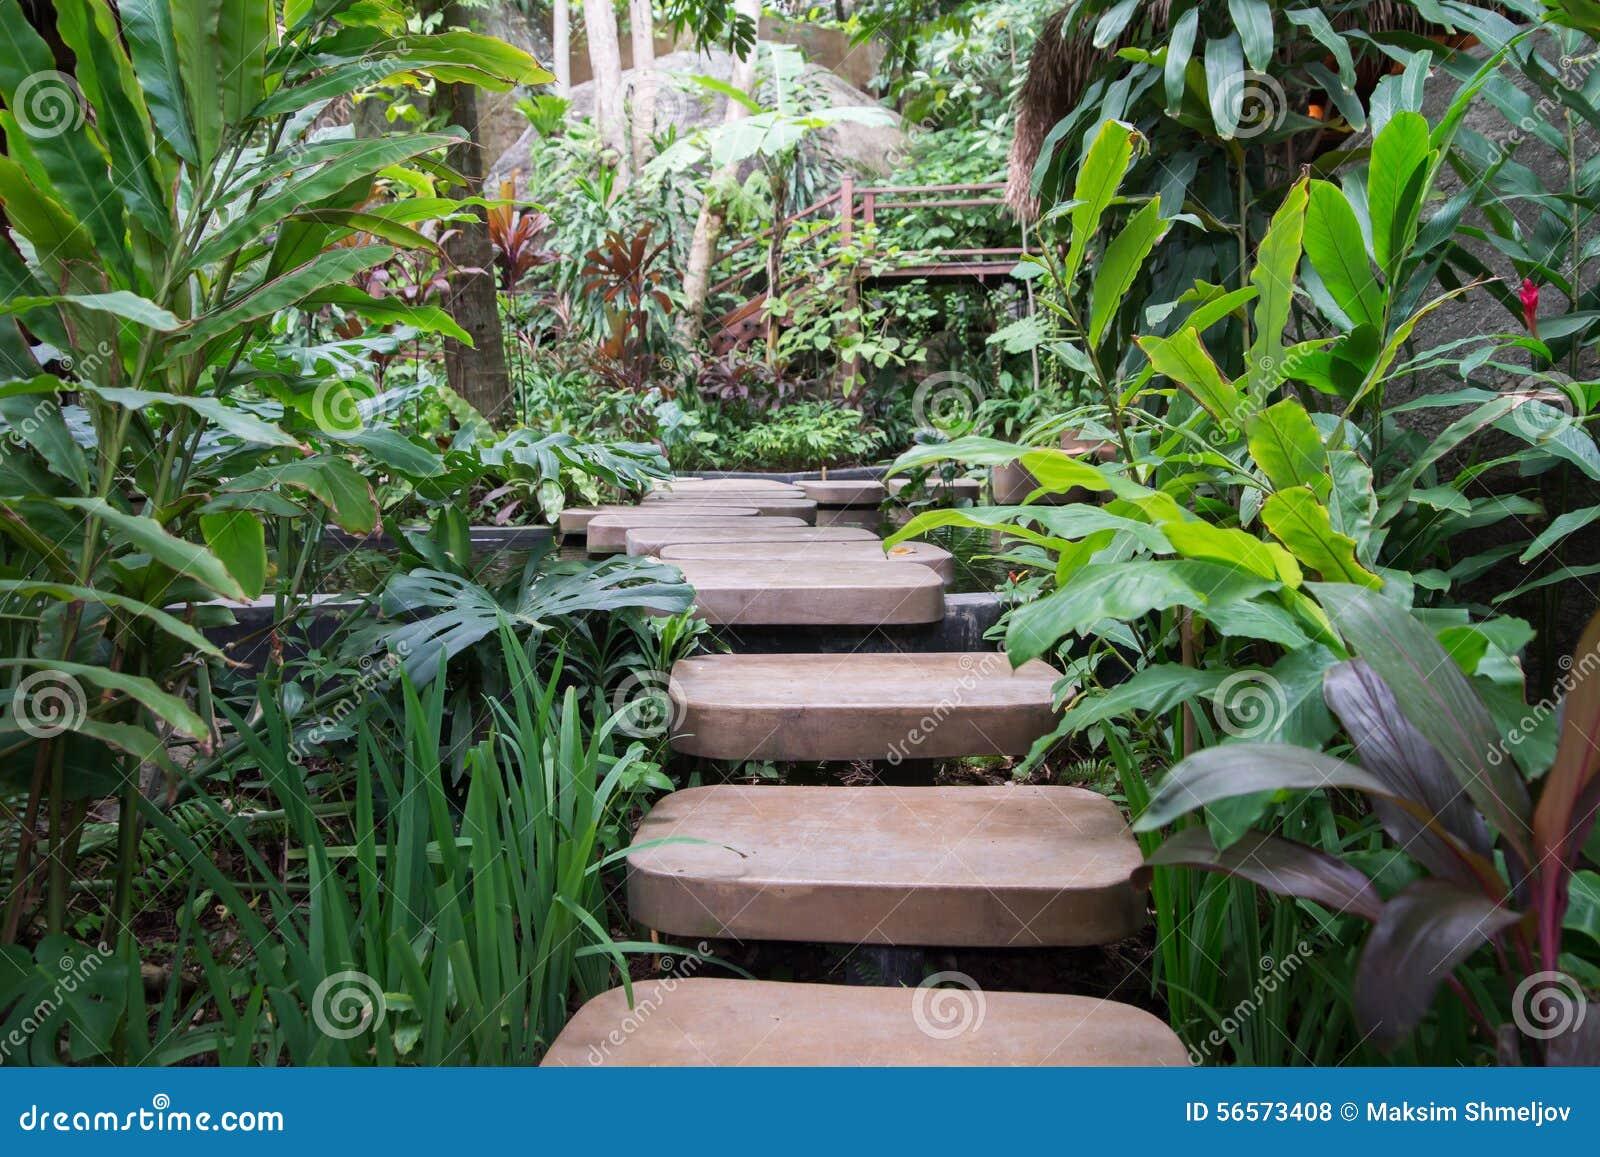 Download Περπατημένη πορεία μέσω της ταϊλανδικής φύσης Στοκ Εικόνες - εικόνα από ζούγκλα, δάσος: 56573408